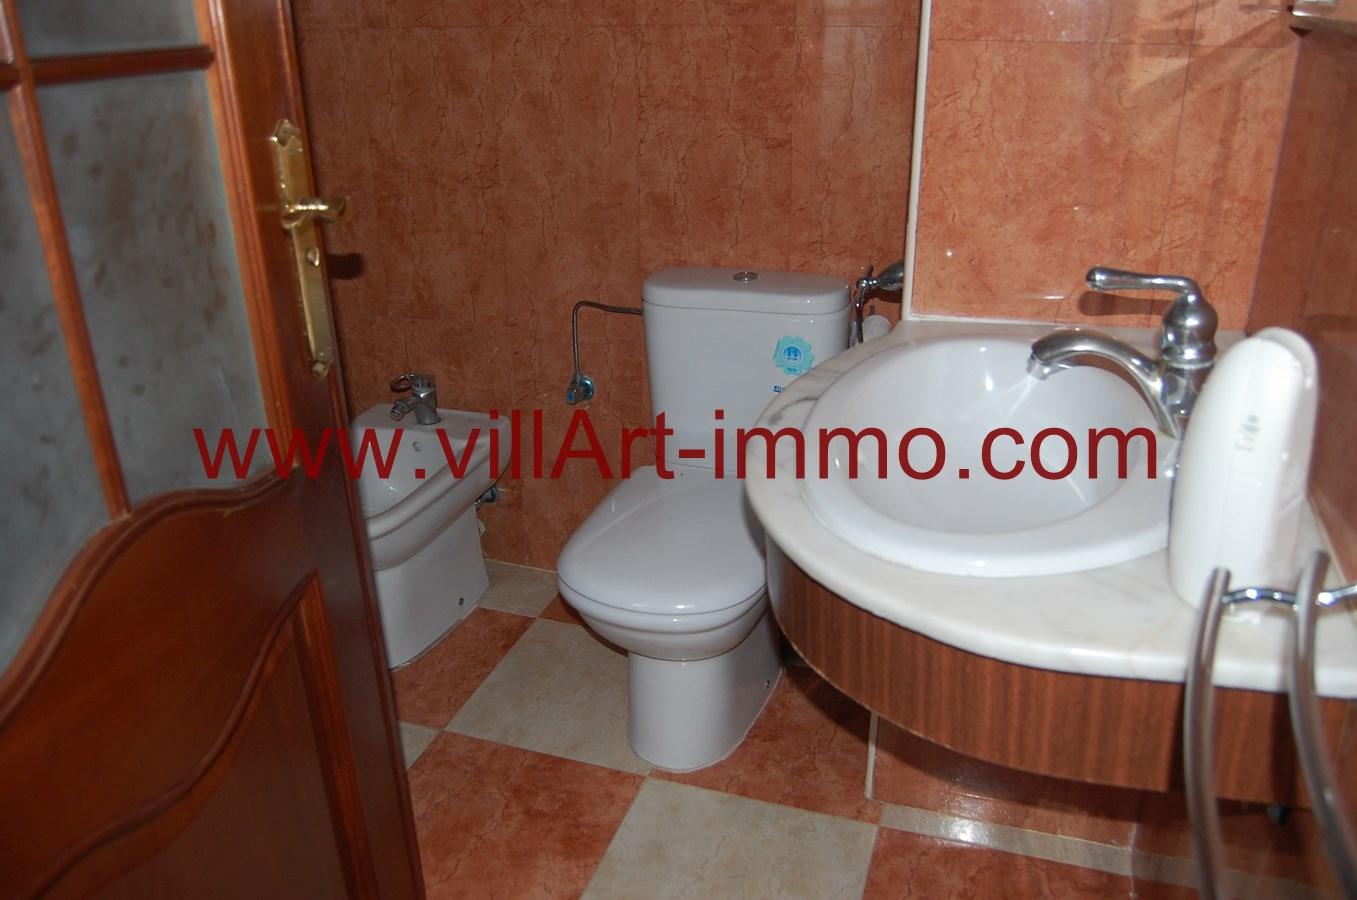 8-a-louer-appartement-non-meuble-tanger-salle-de-bain-2-l891-villart-immo